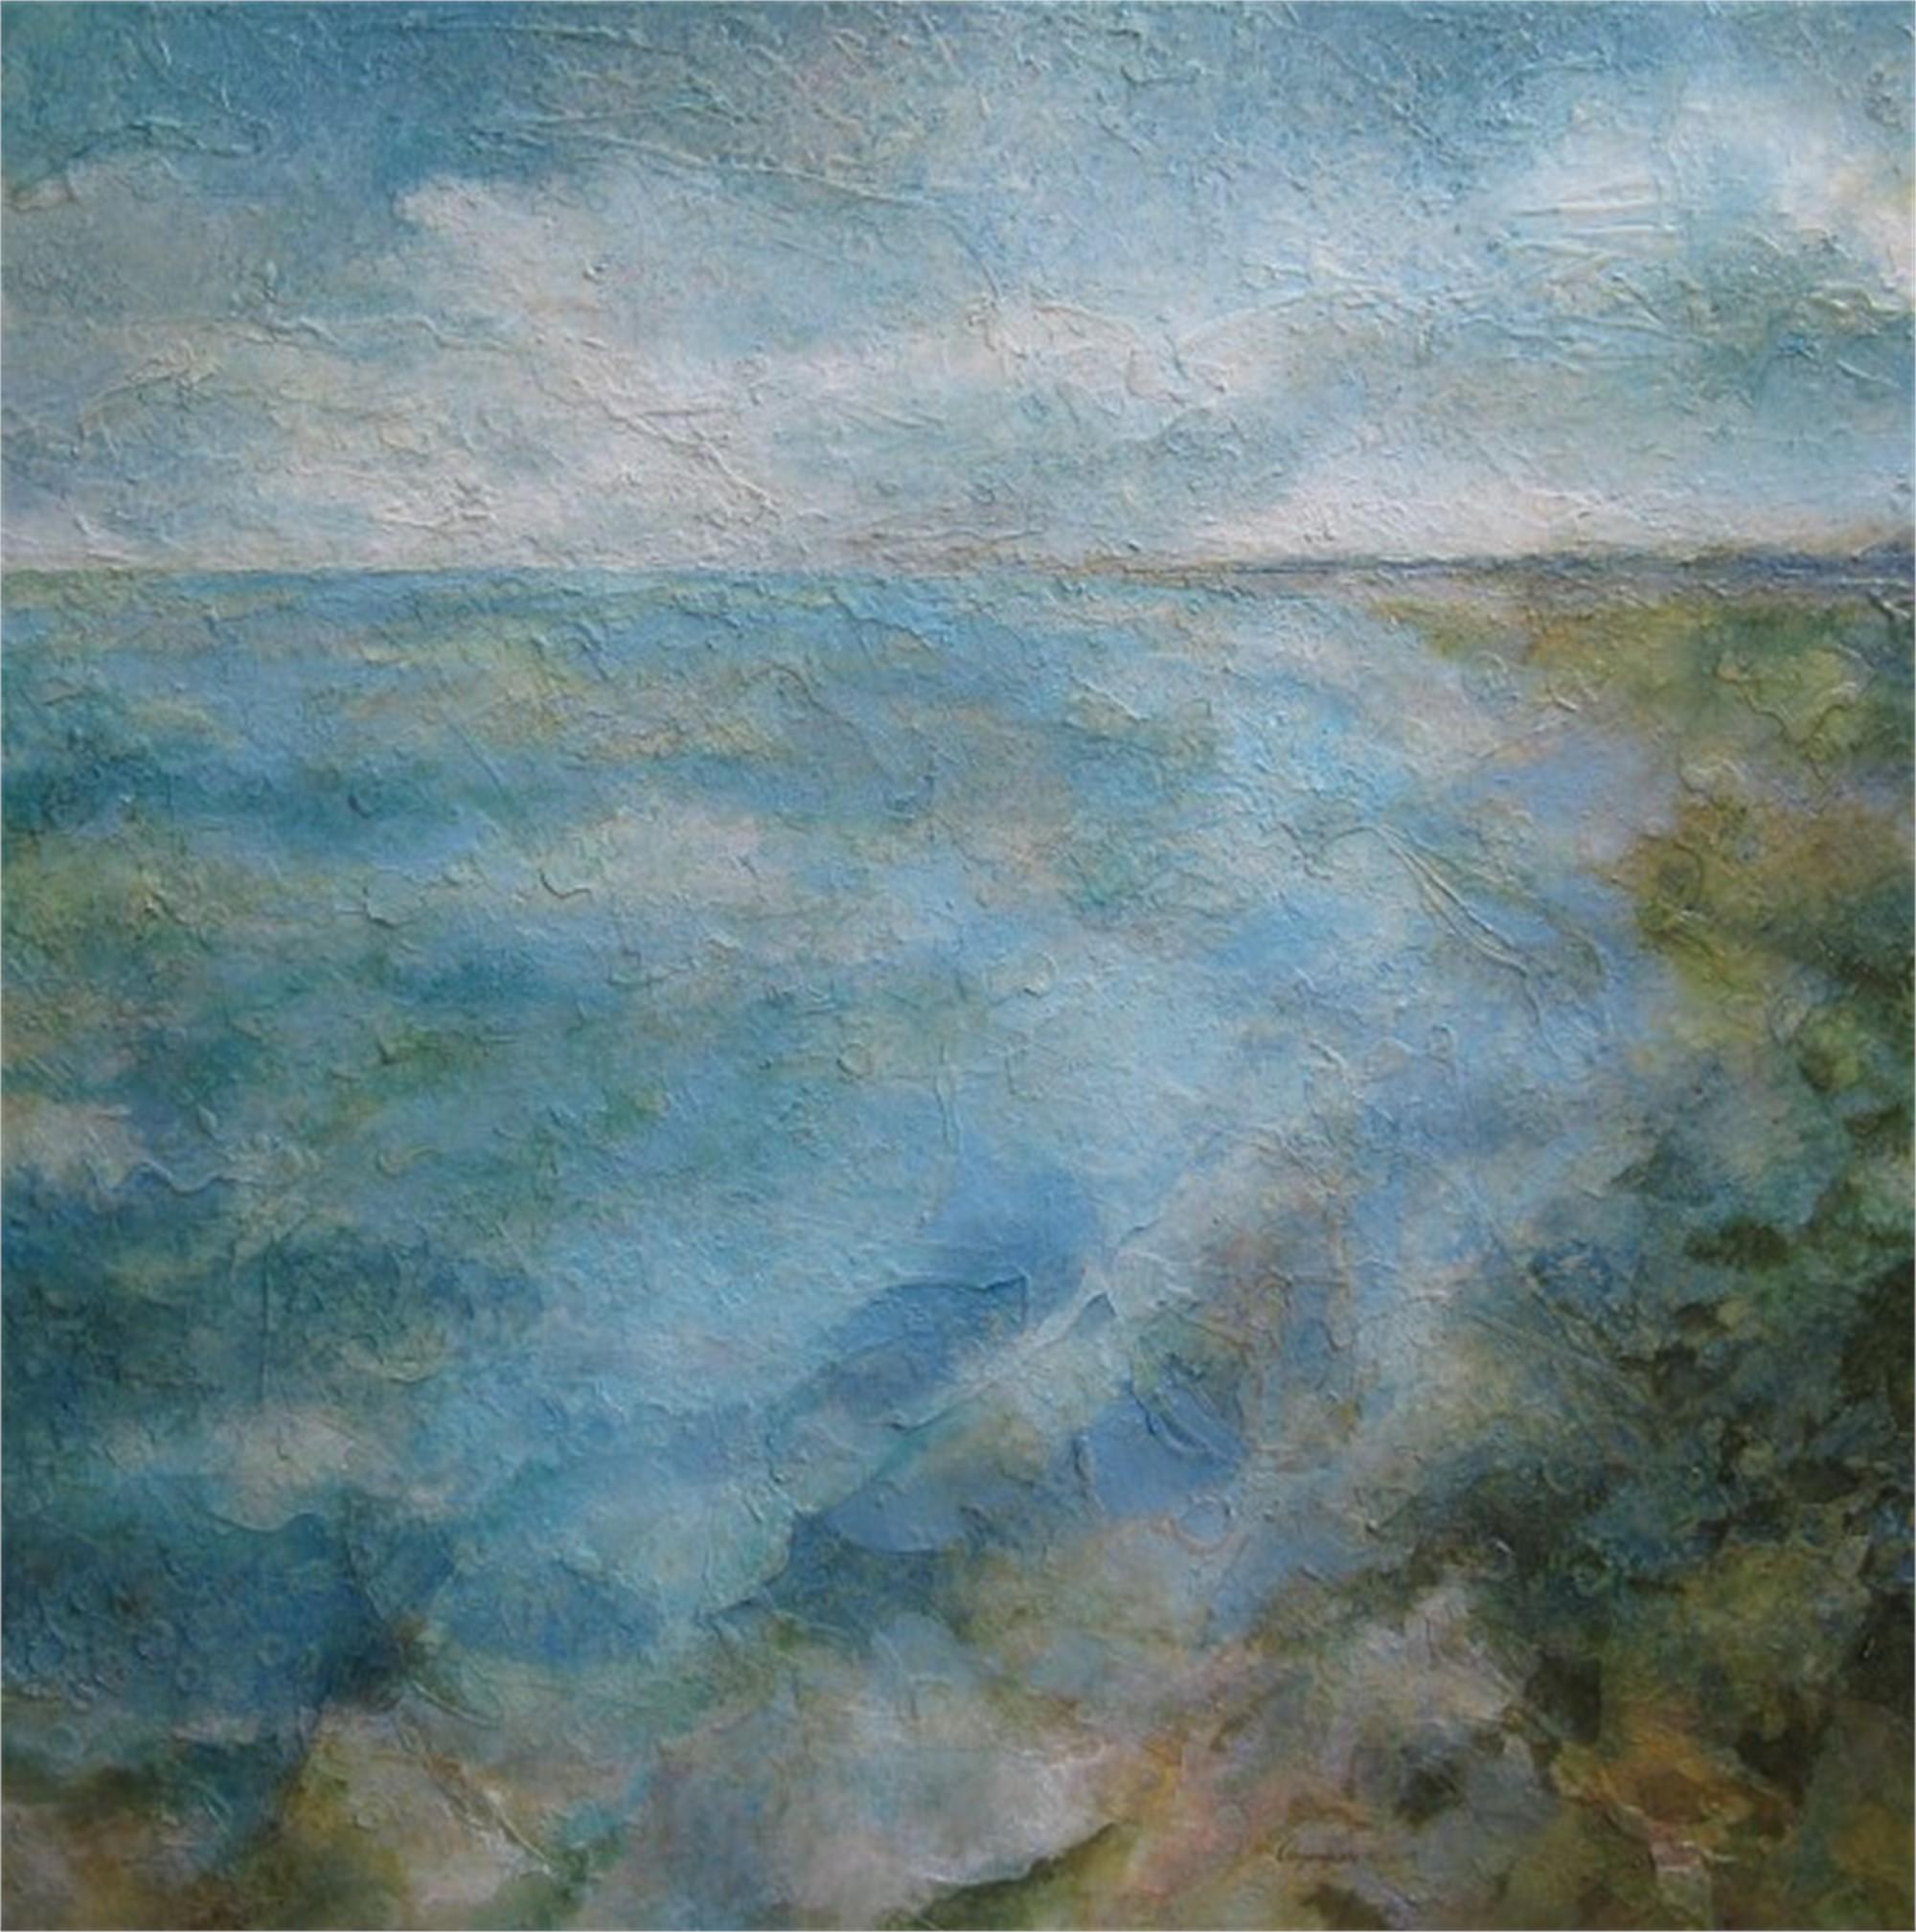 Sea Mist #2 by Bob Chrzanowski